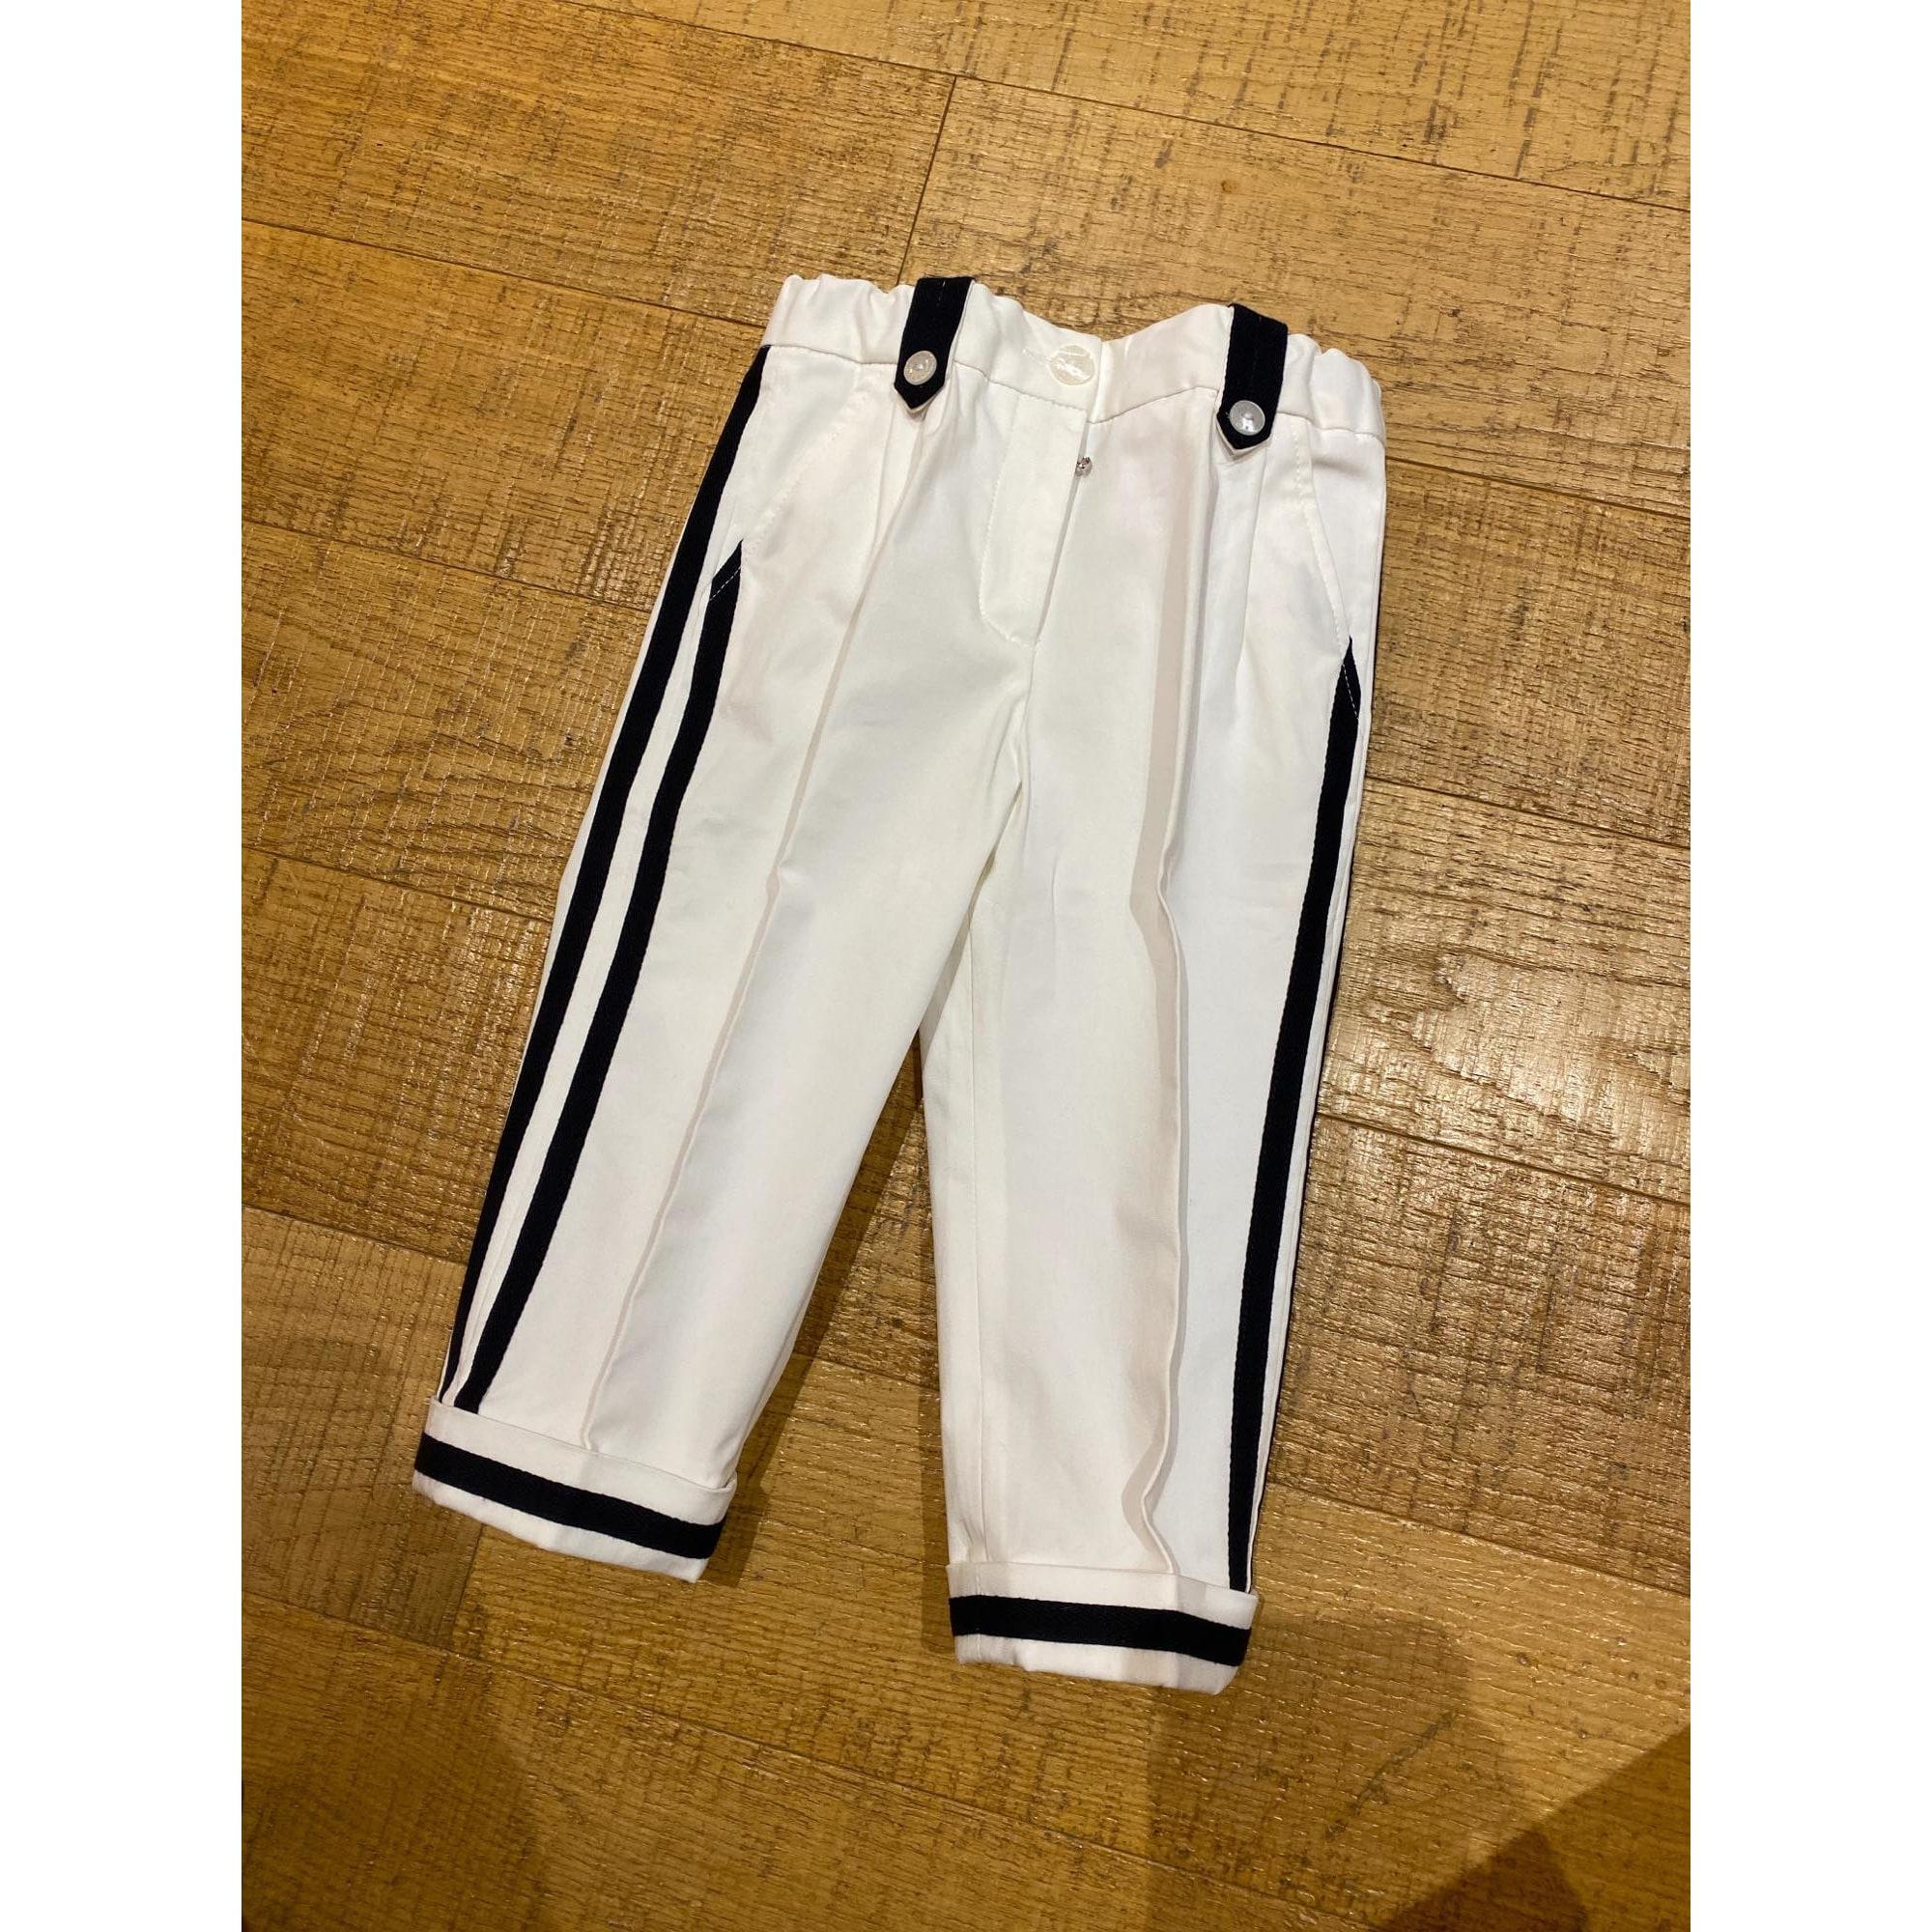 Pantalon DOLCE & GABBANA Blanc, blanc cassé, écru